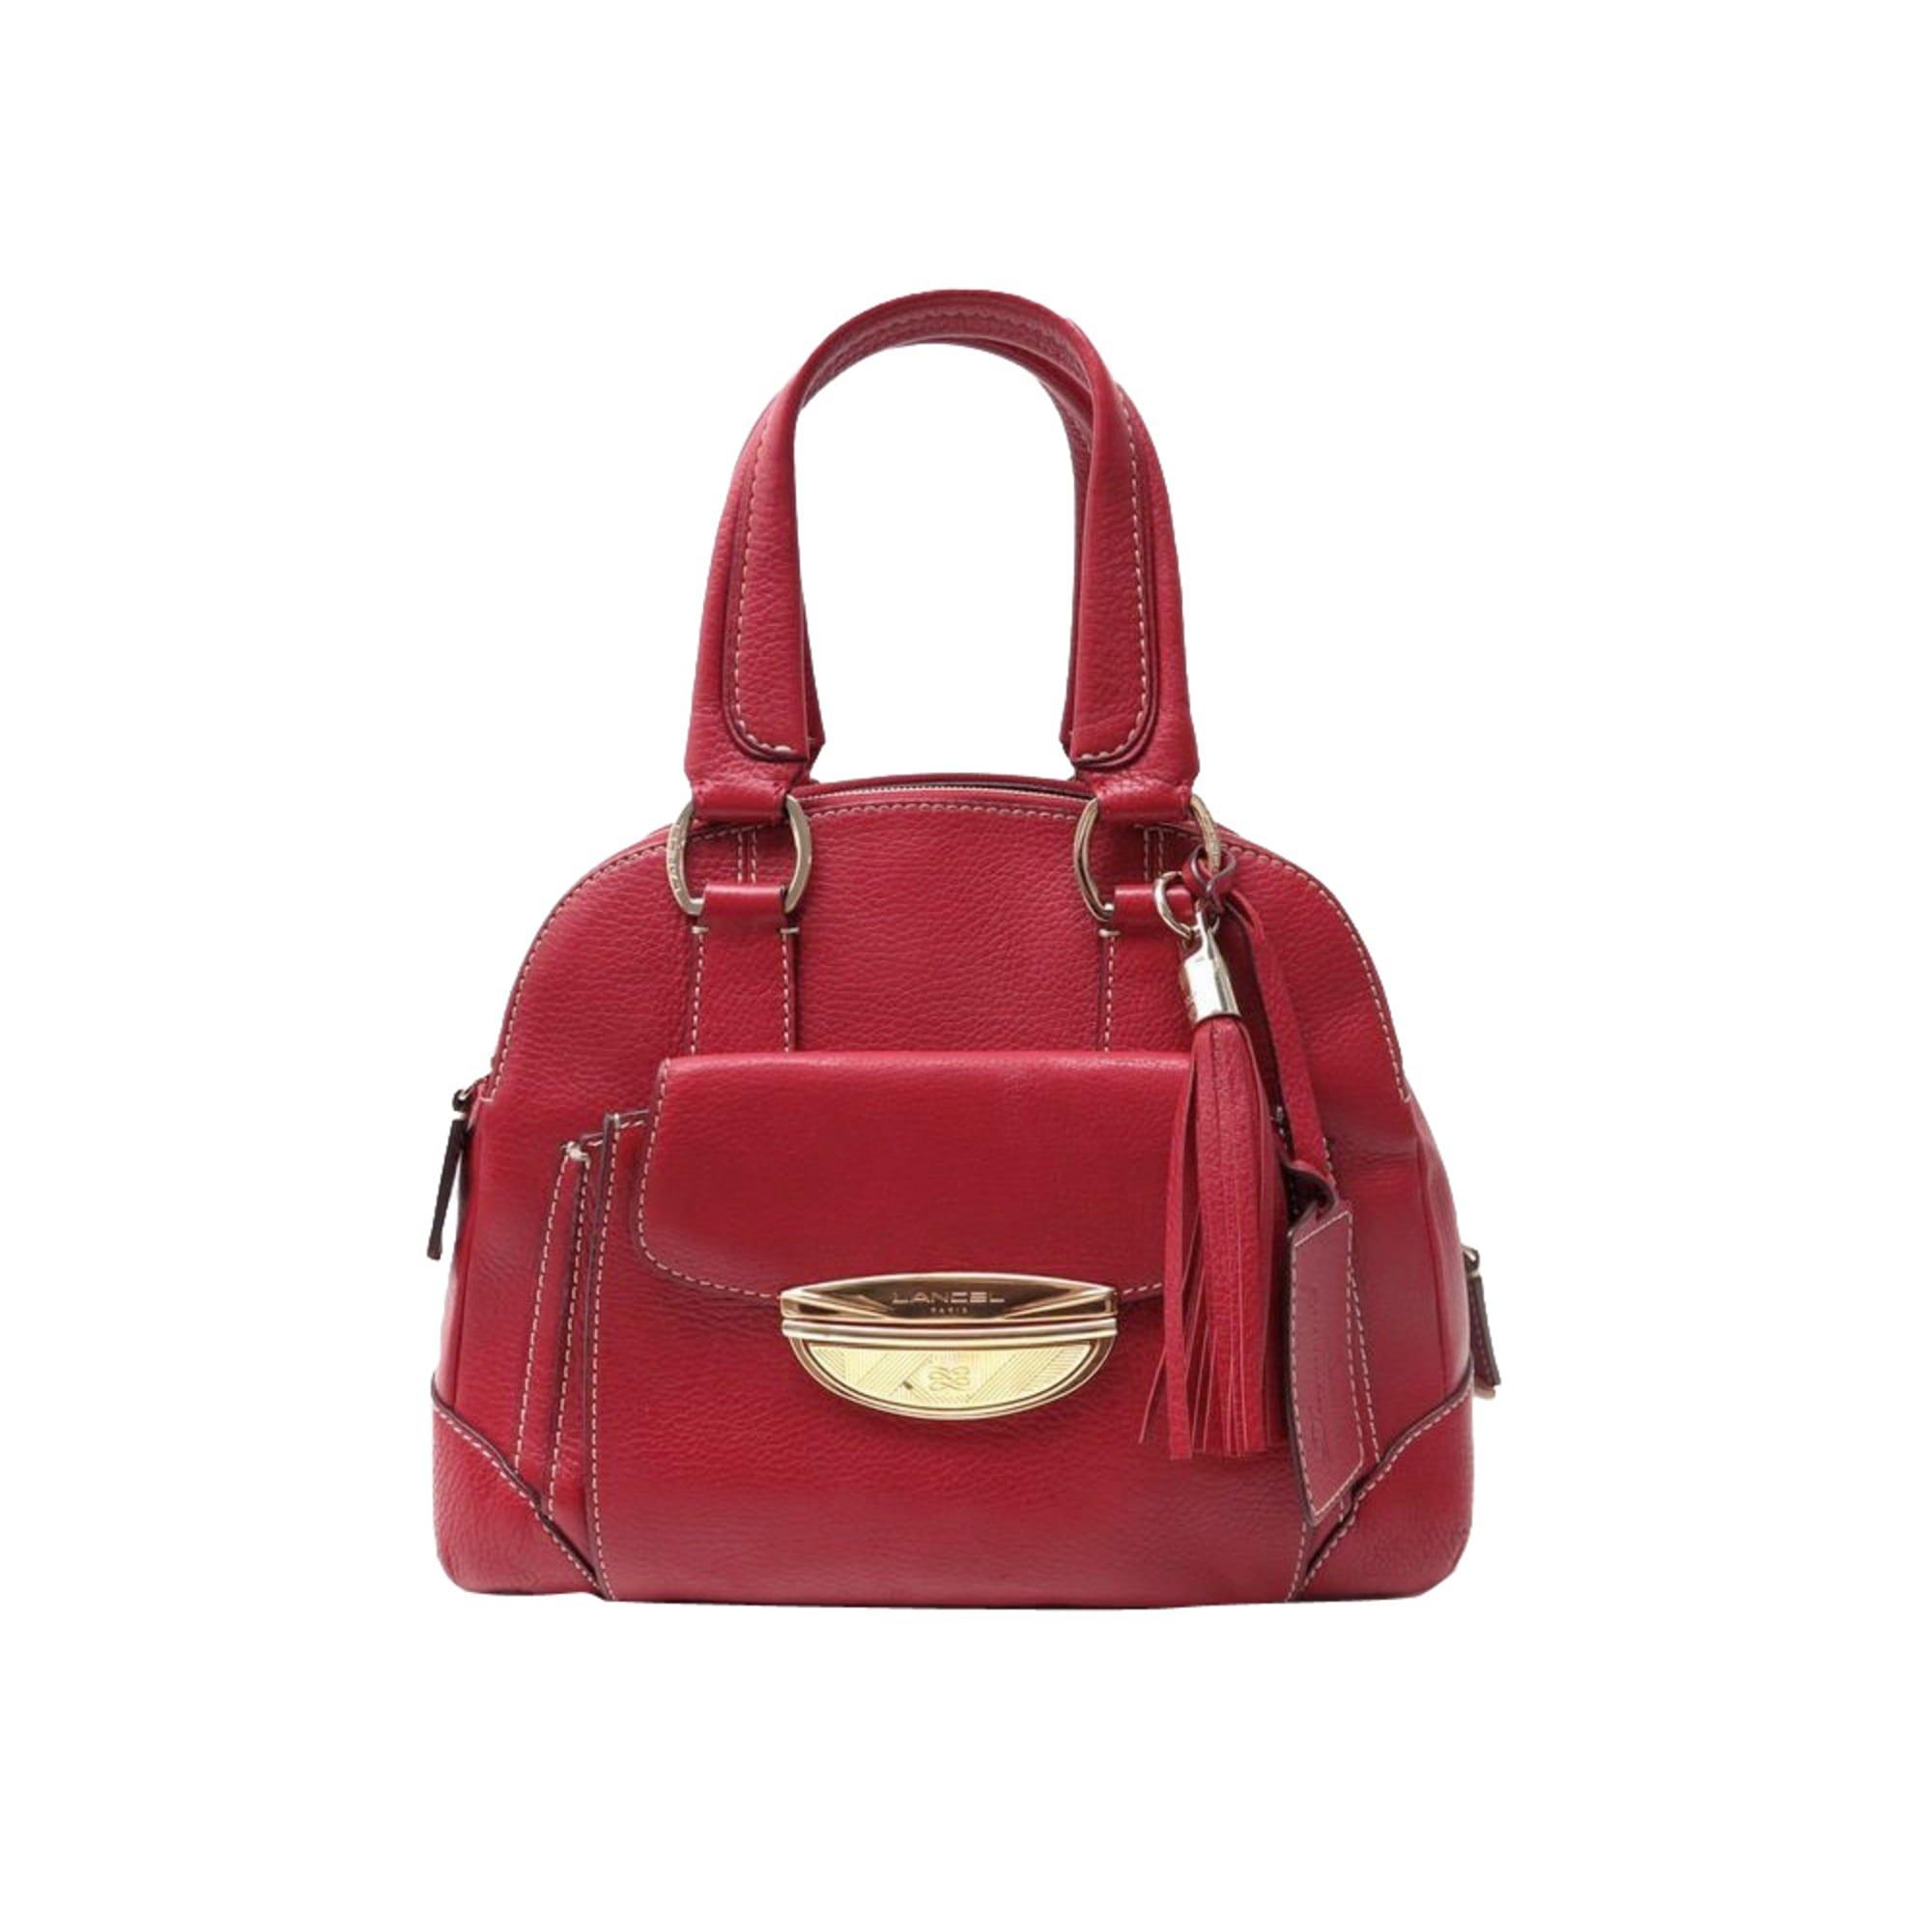 leather handbag lancel red 7518035